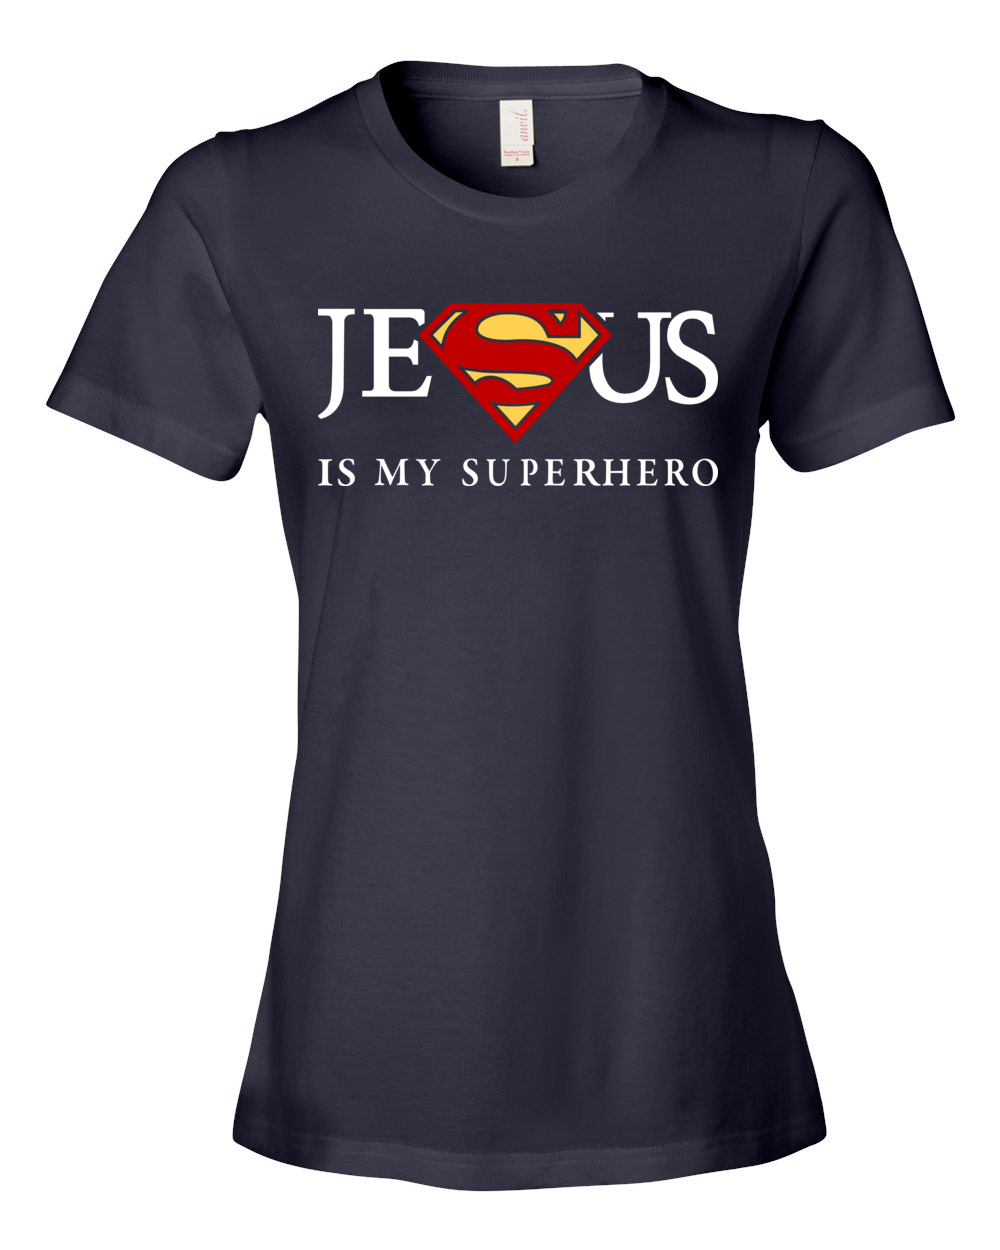 Women s Jesus Is My Superhero Camisetas Superheroes c1aed2f9c37b9